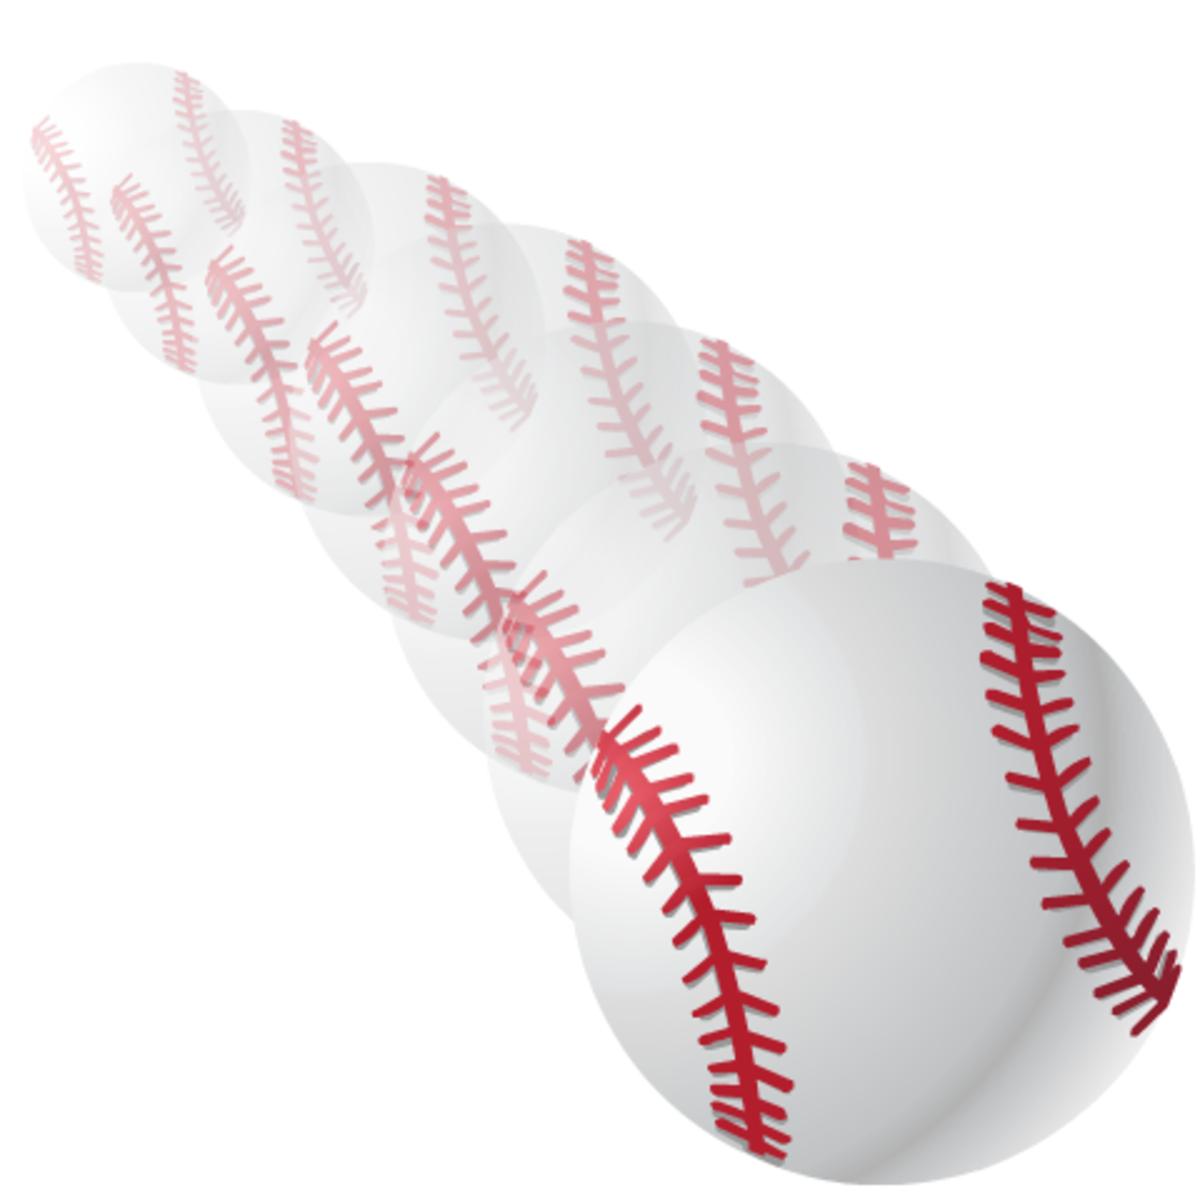 Baseball image: flying baseball